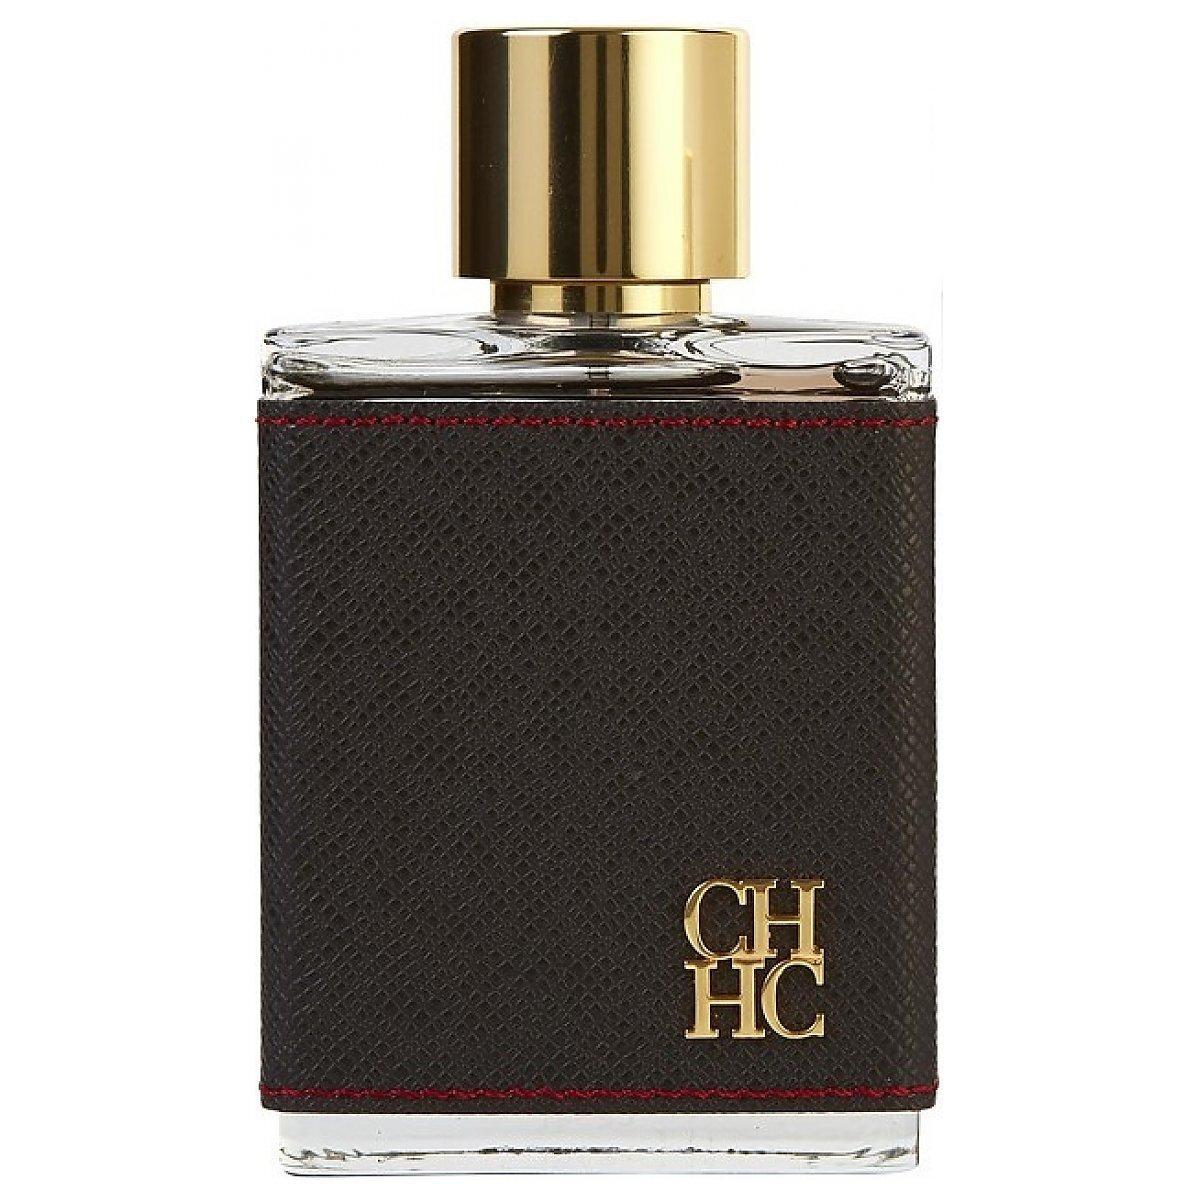 b6bfcbe89b51a Carolina Herrera CH Men Woda toaletowa spray 100ml - Perfumeria Dolce.pl